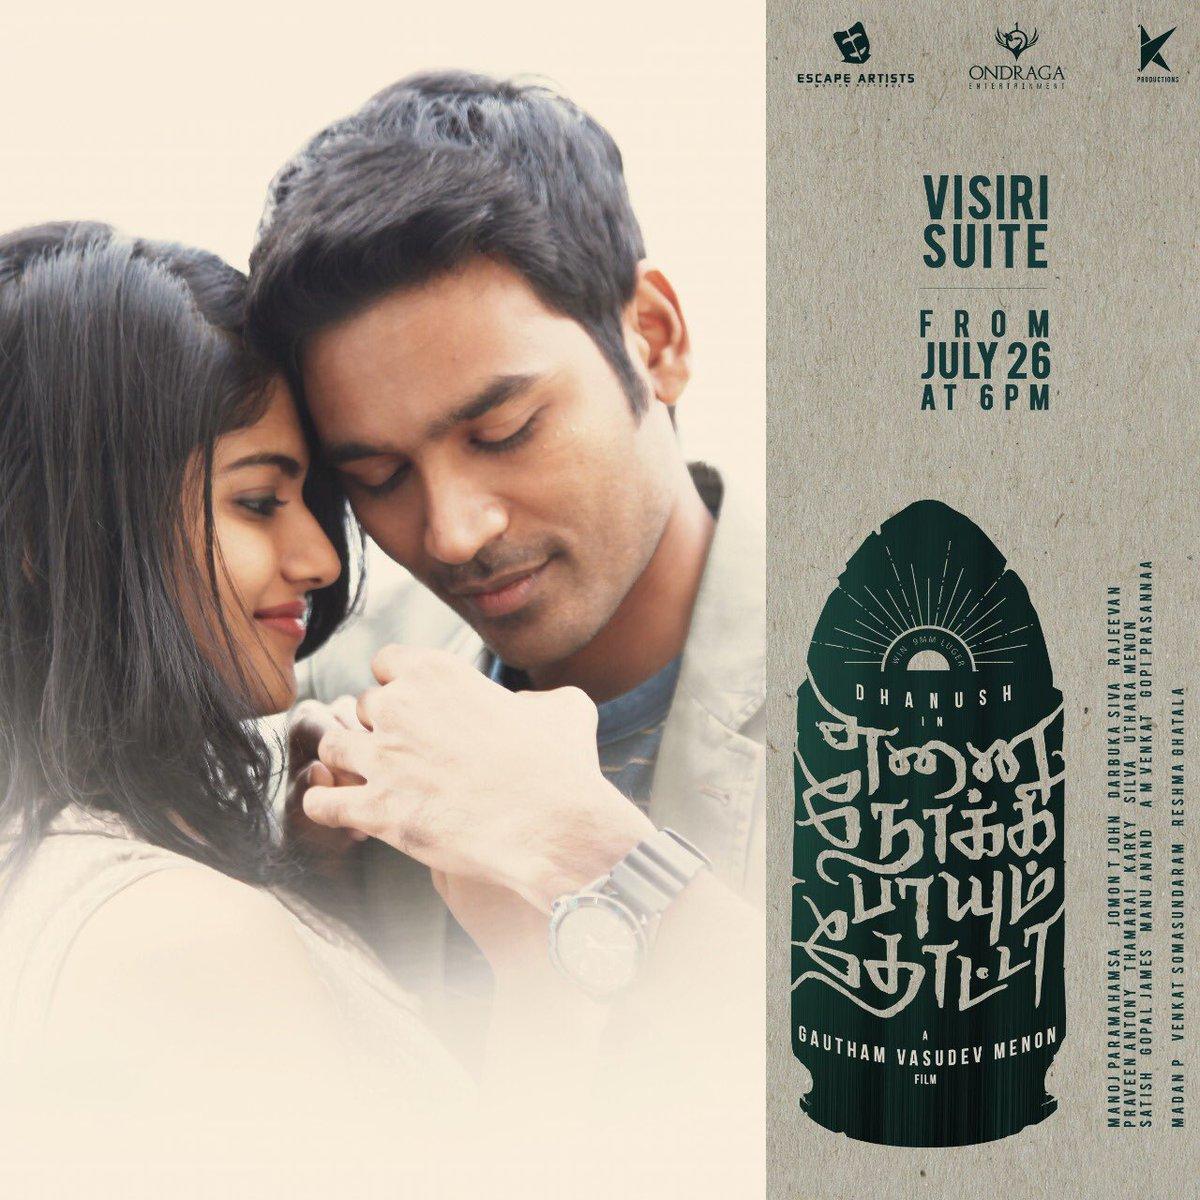 Enai Noki Paayum Thotta Movie Visiri Suite Single from July 26th, 6pm